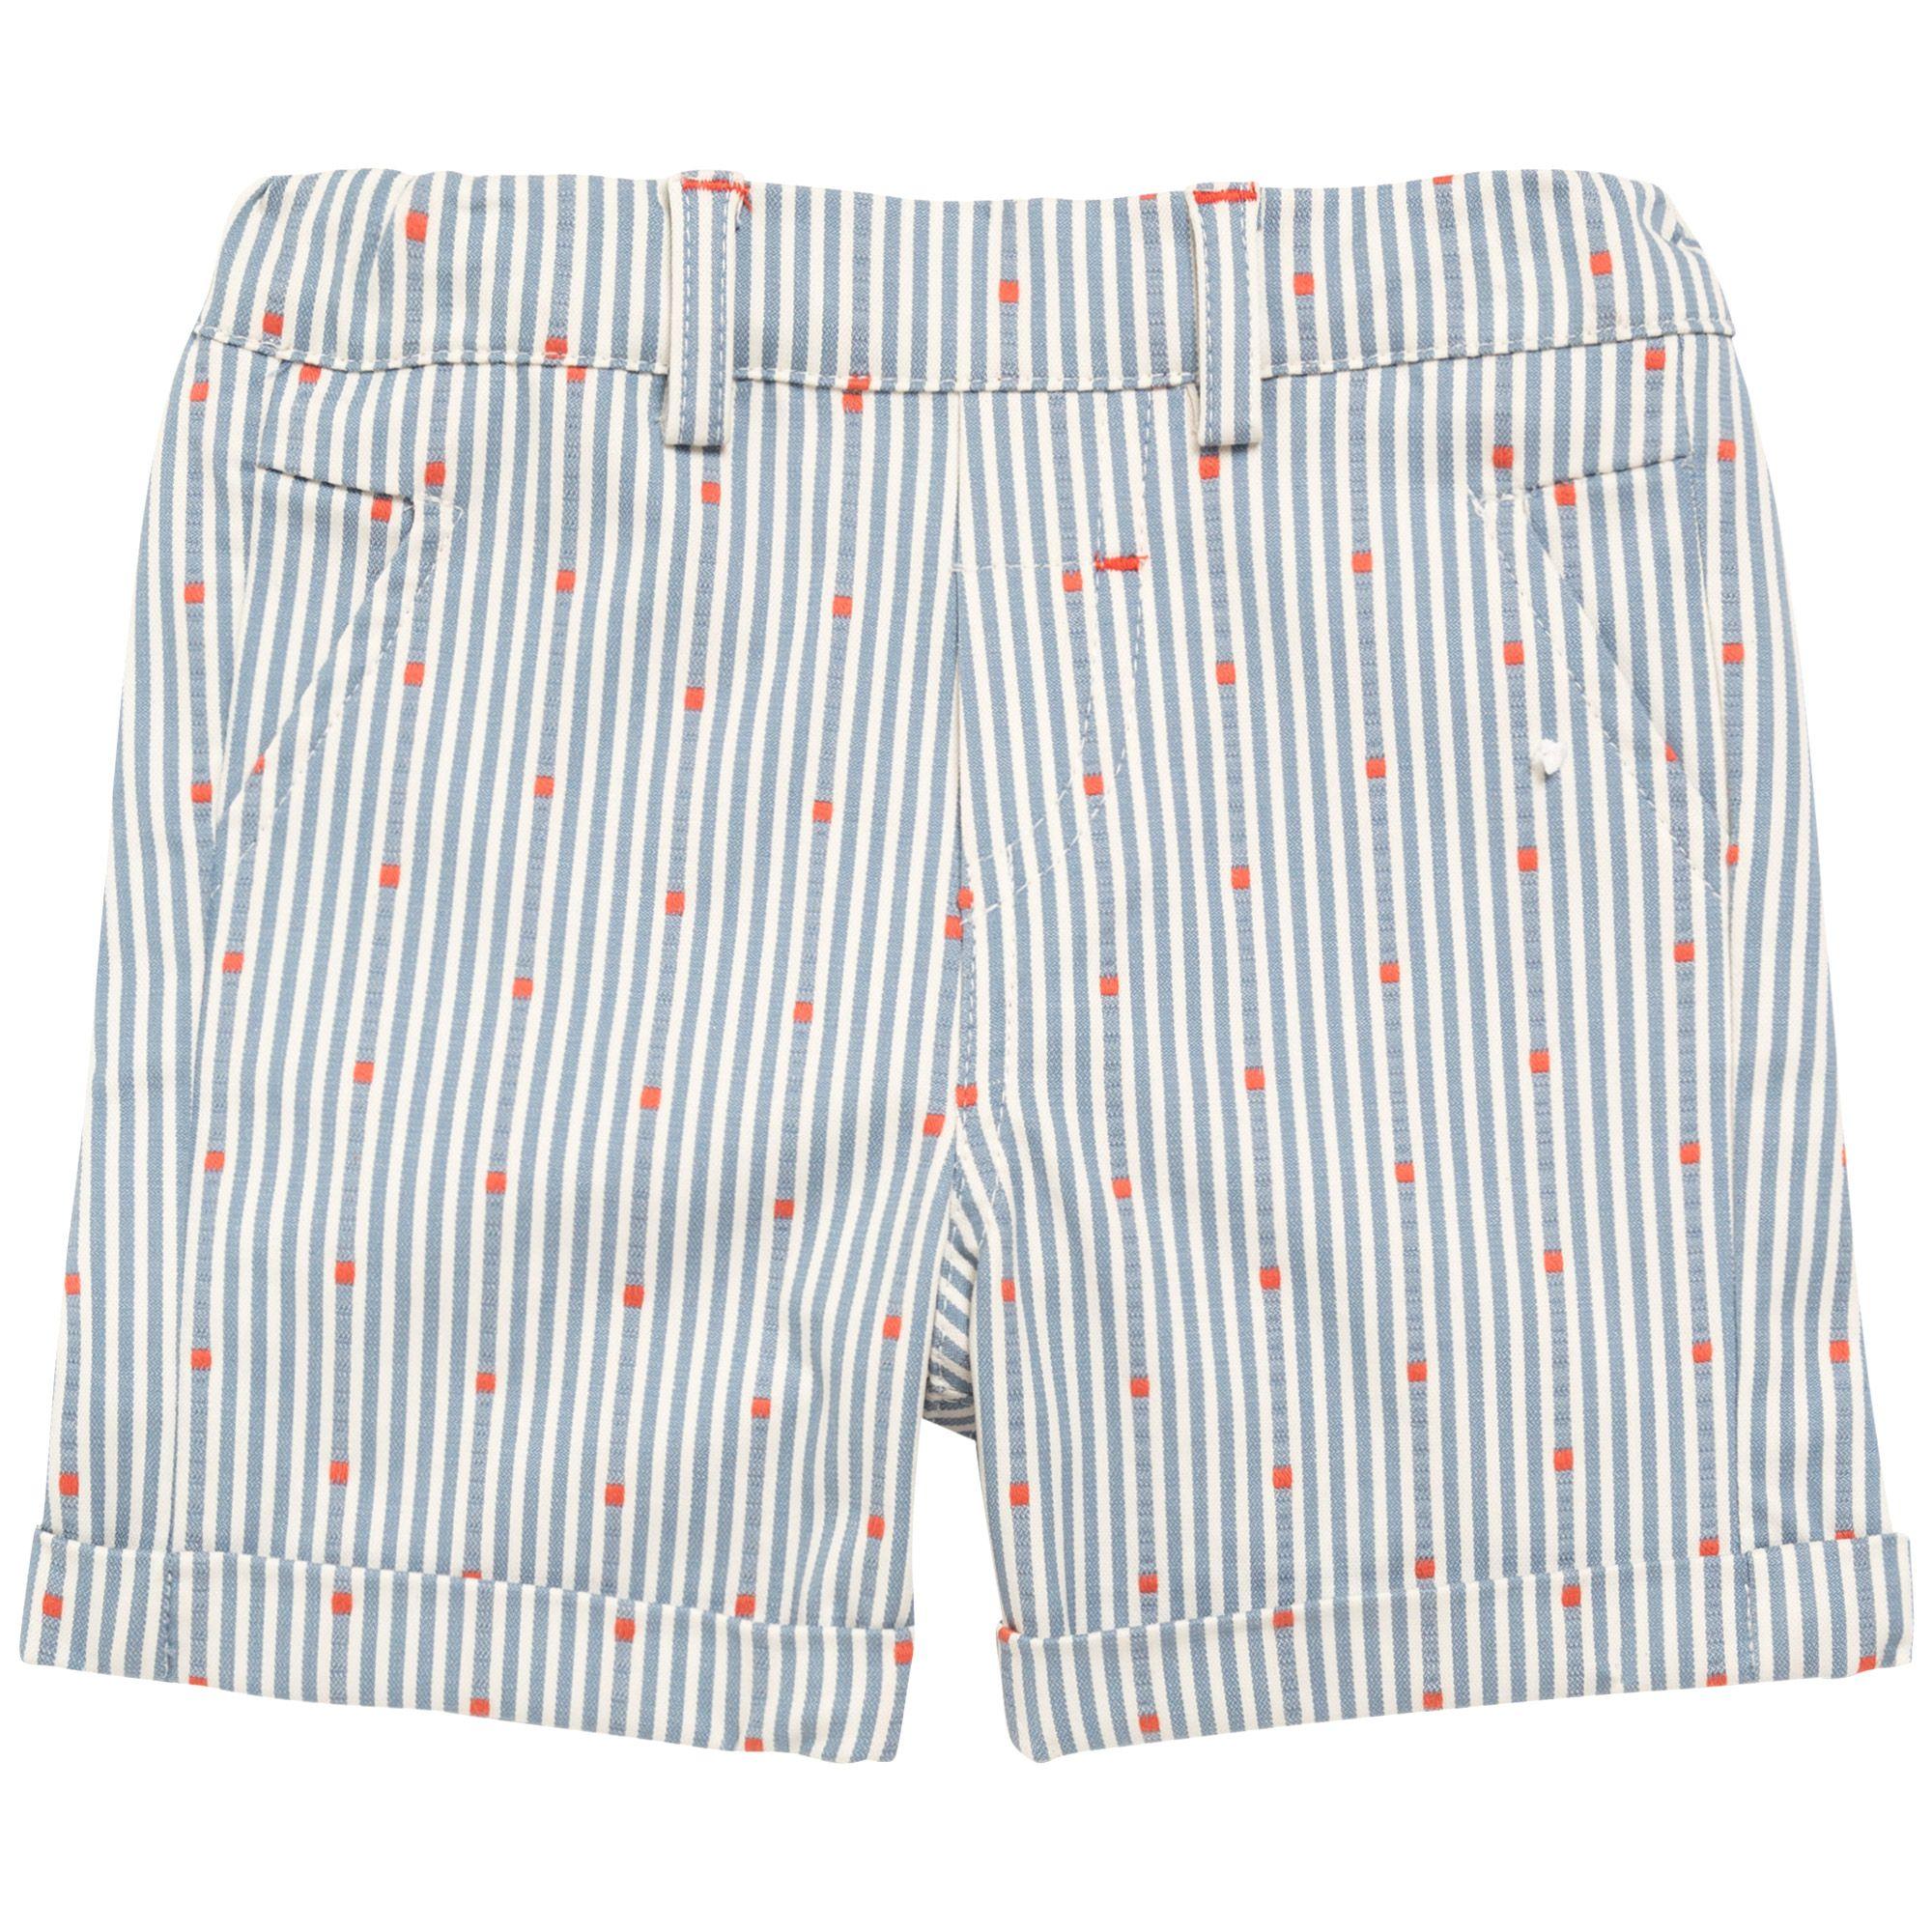 Bebe Corto Detalles Naranja Rayas Ro Infantil Niño Pantalon L5RjA4